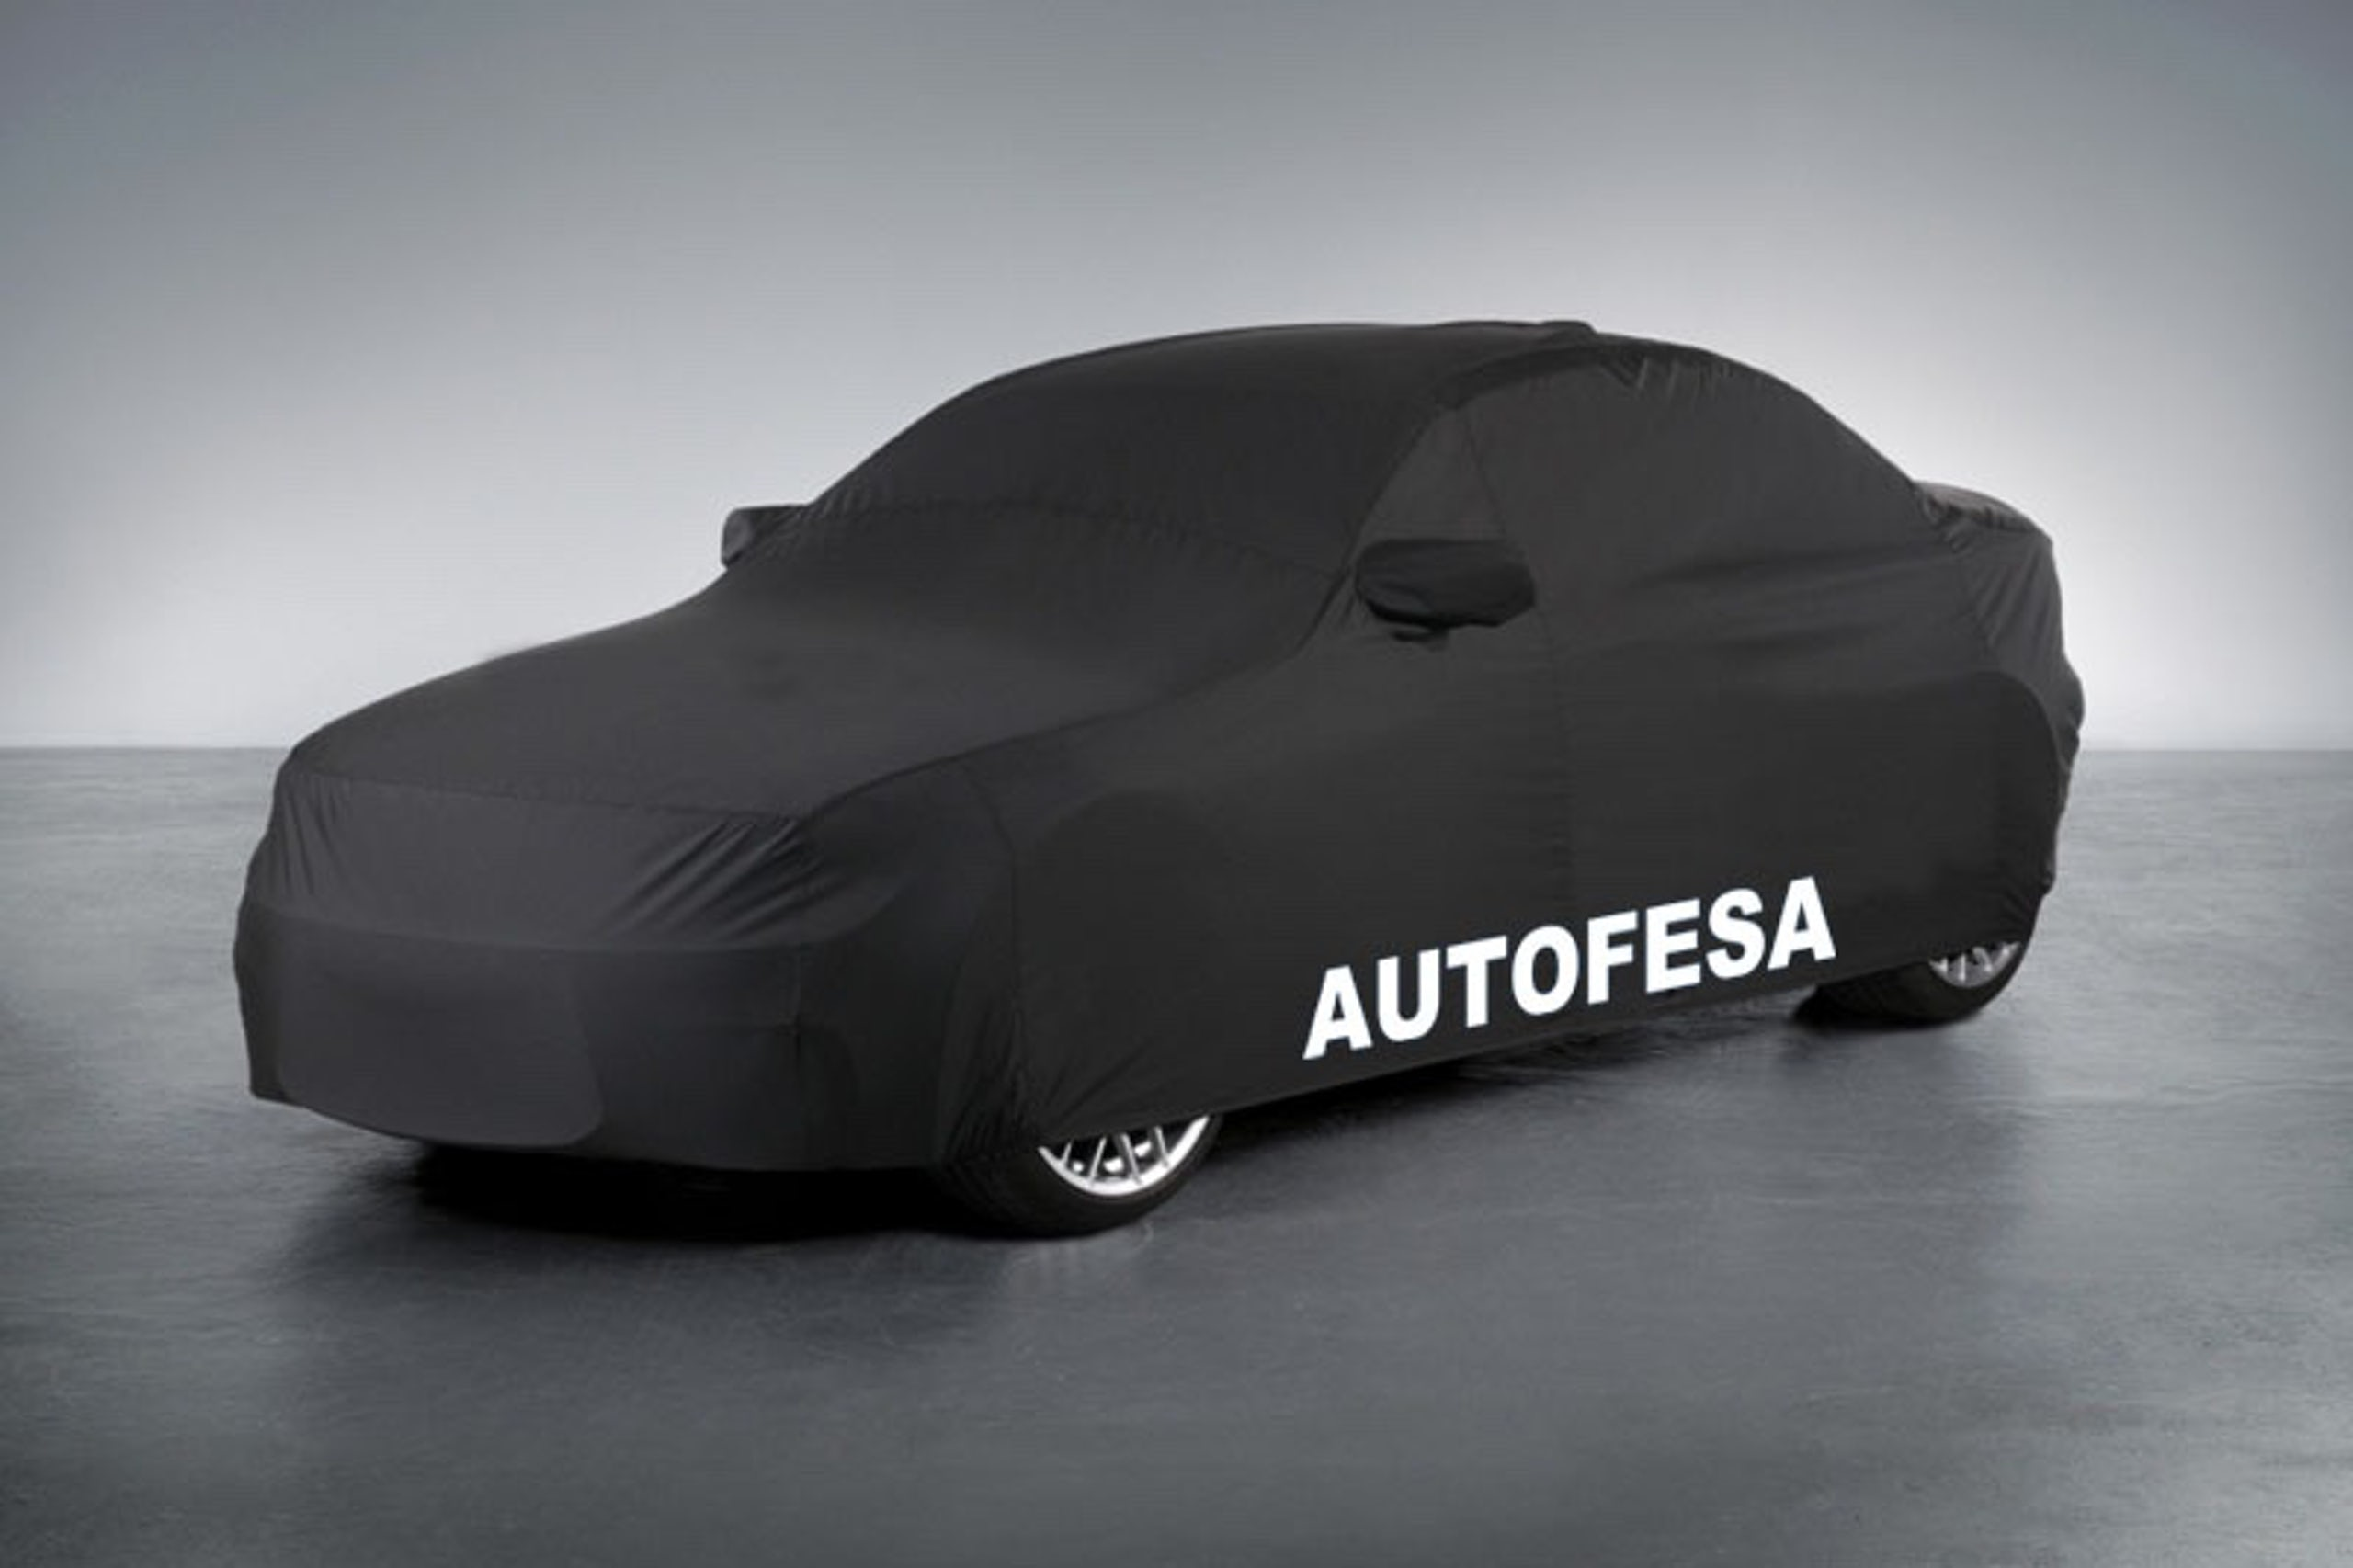 Peugeot Rcz 2.0 HDi 163cv Asphalt 2p FAP - Foto 26